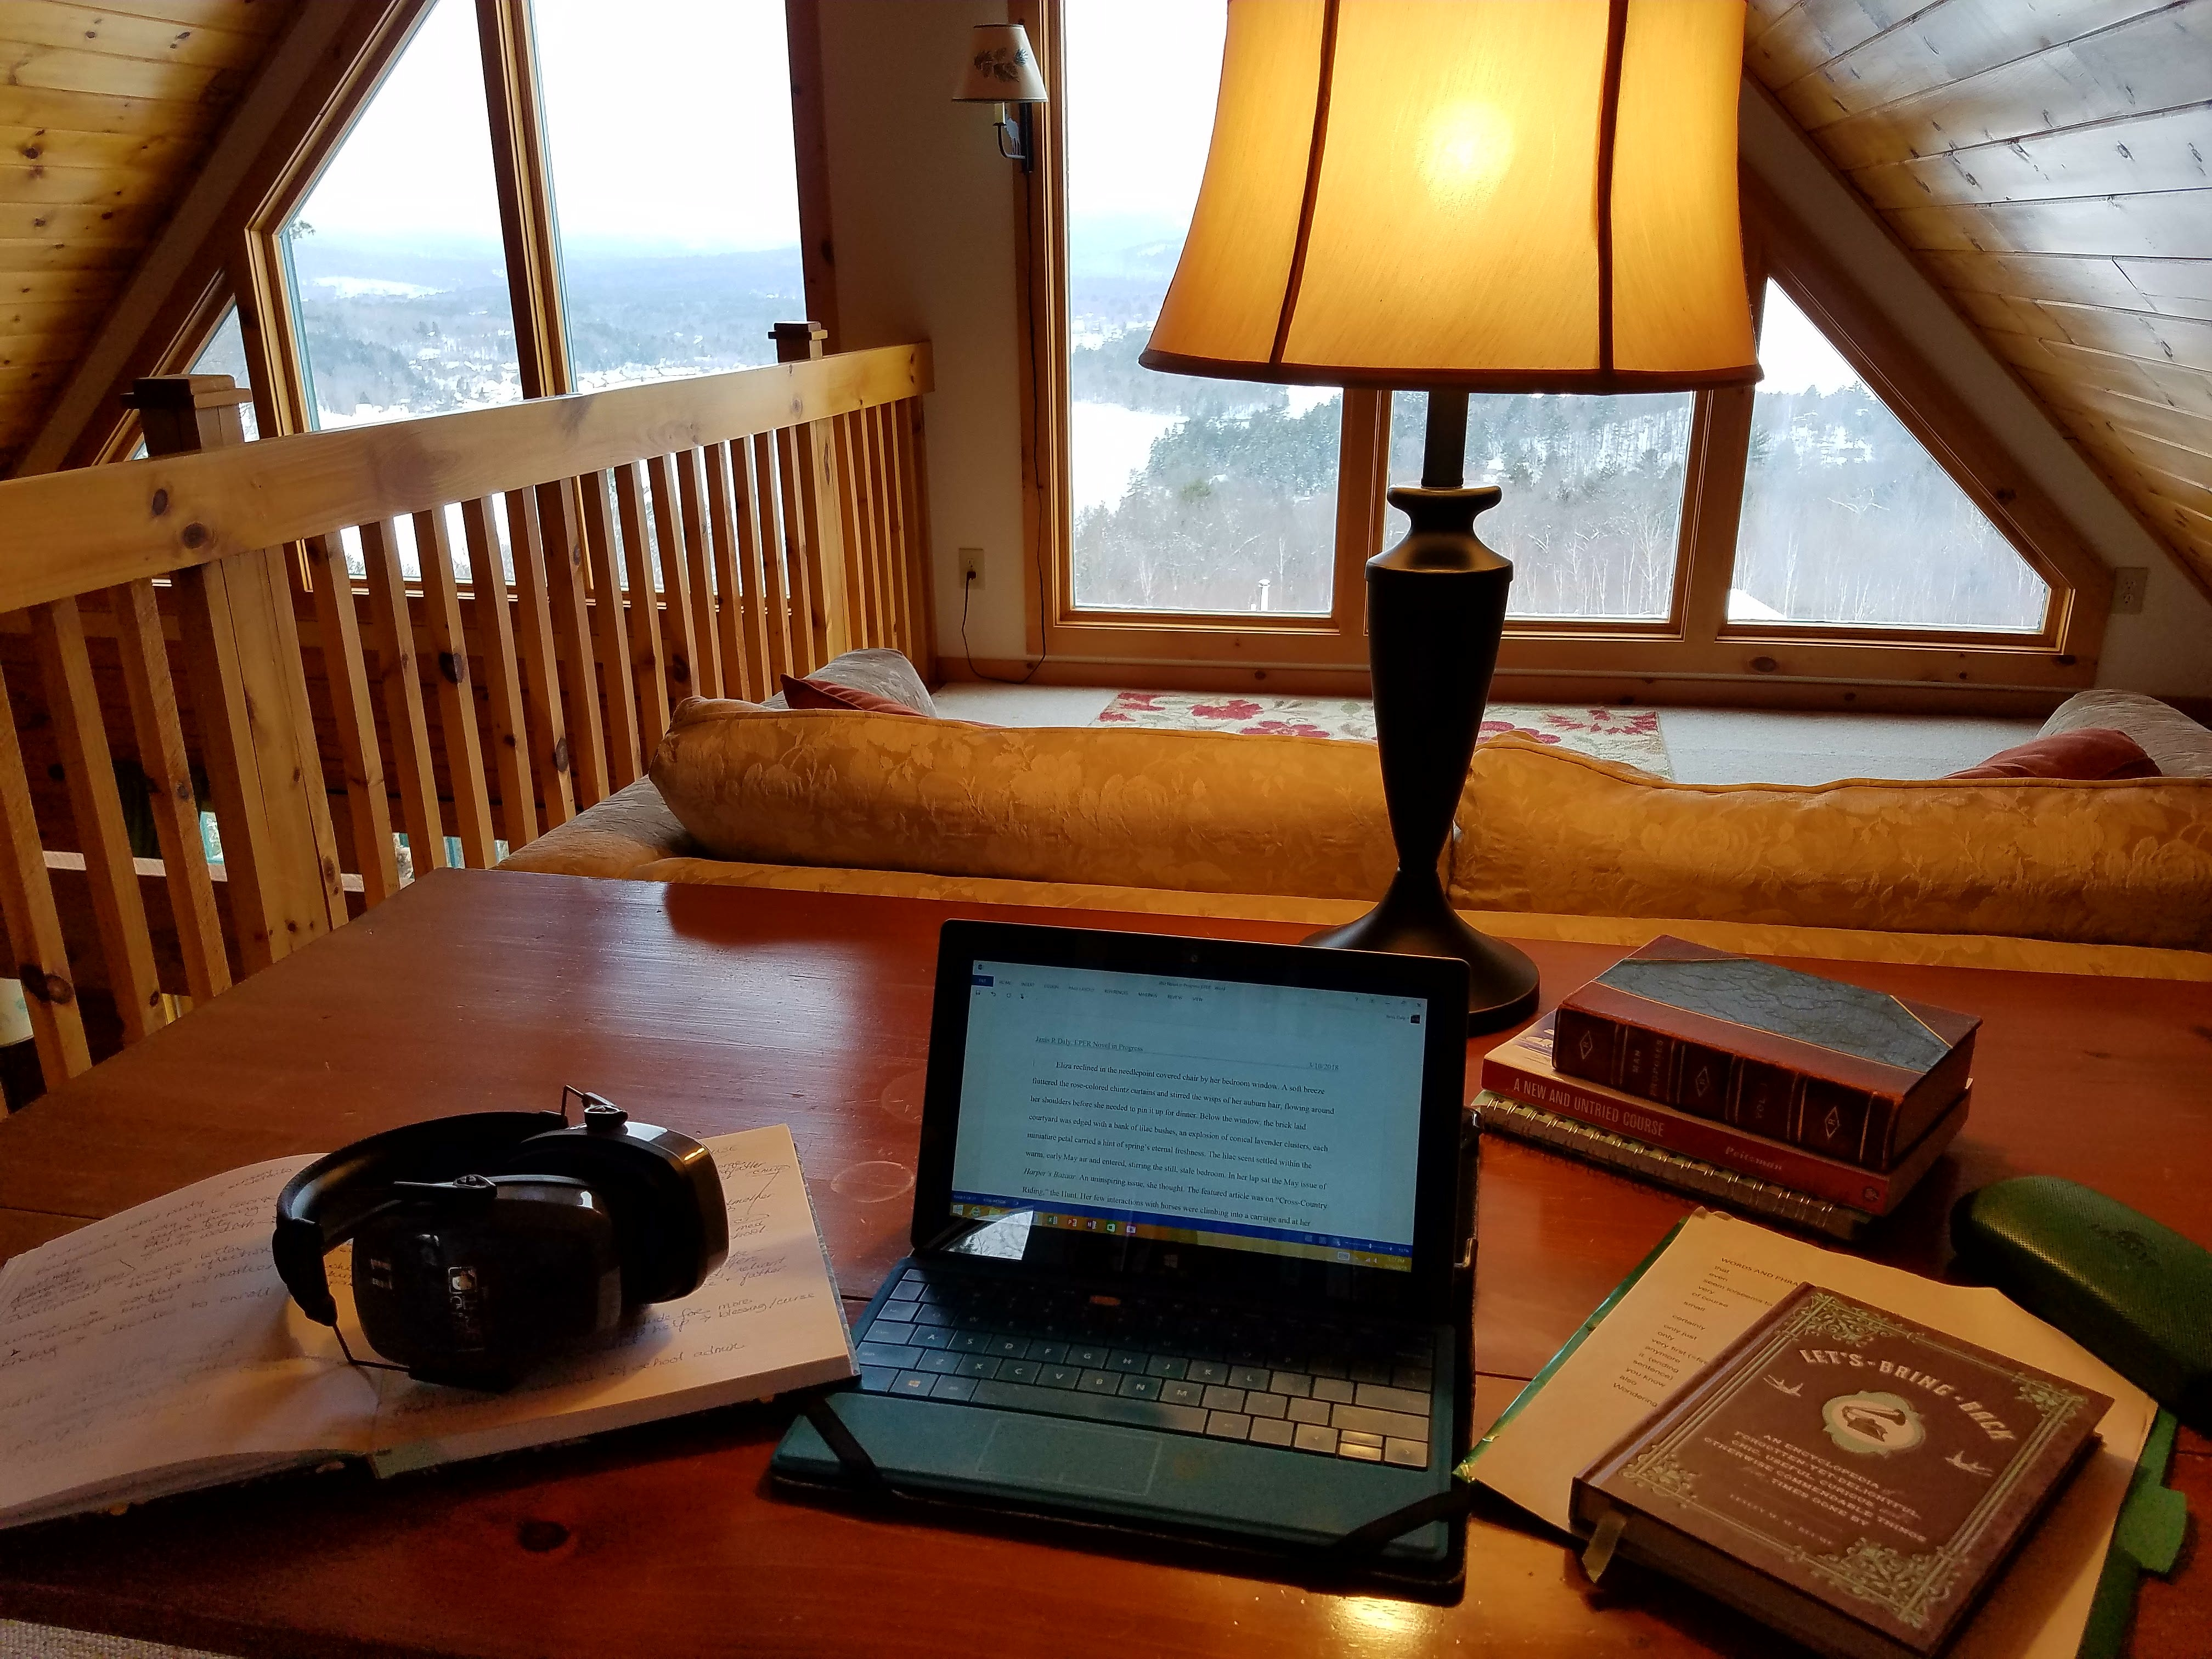 NH writing desk